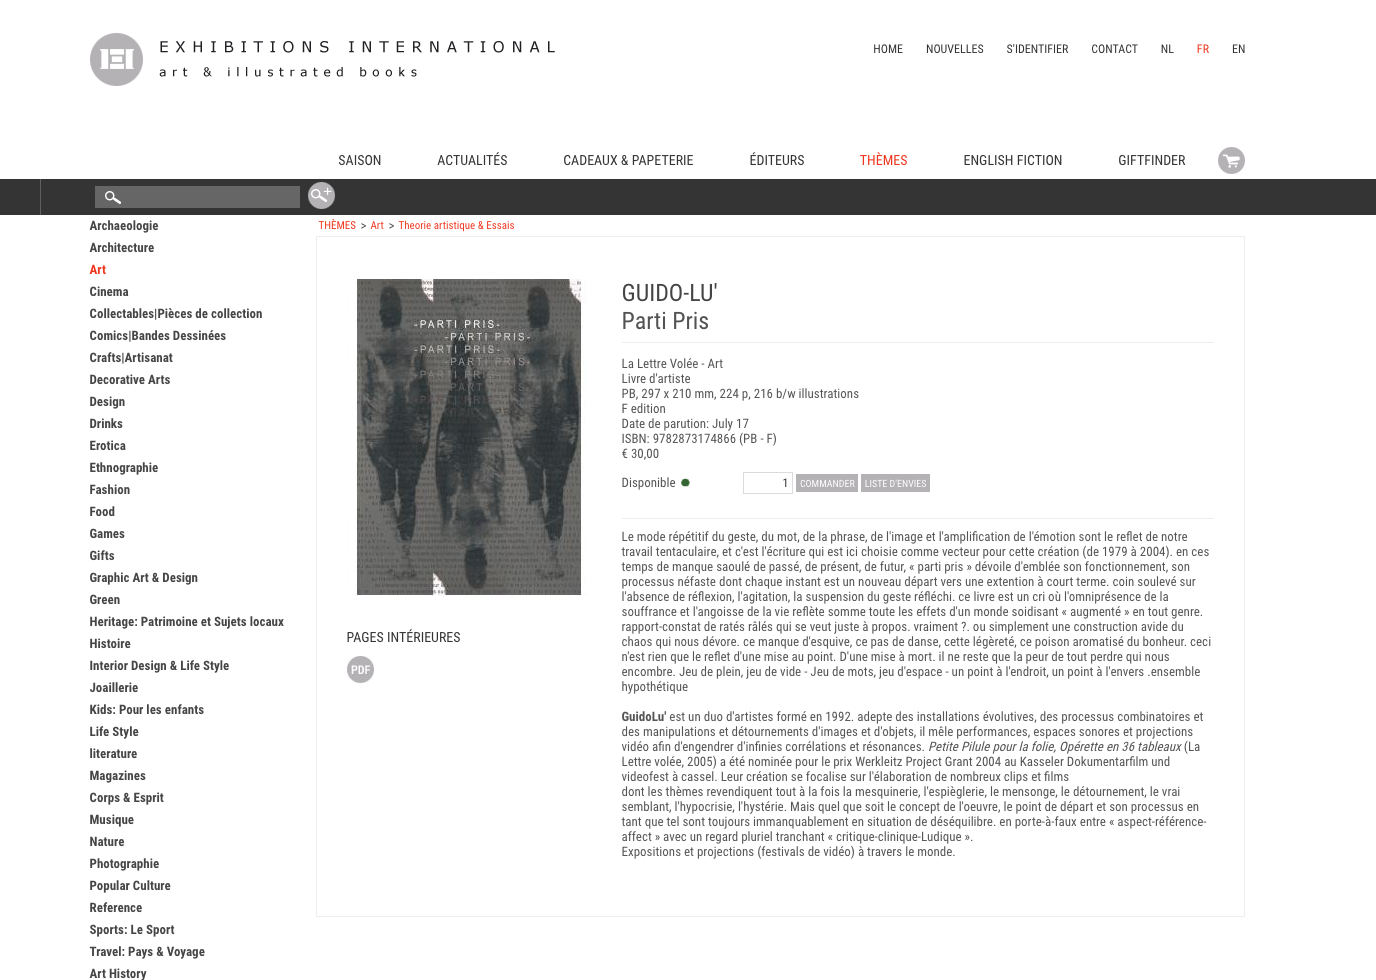 Exhibitions international